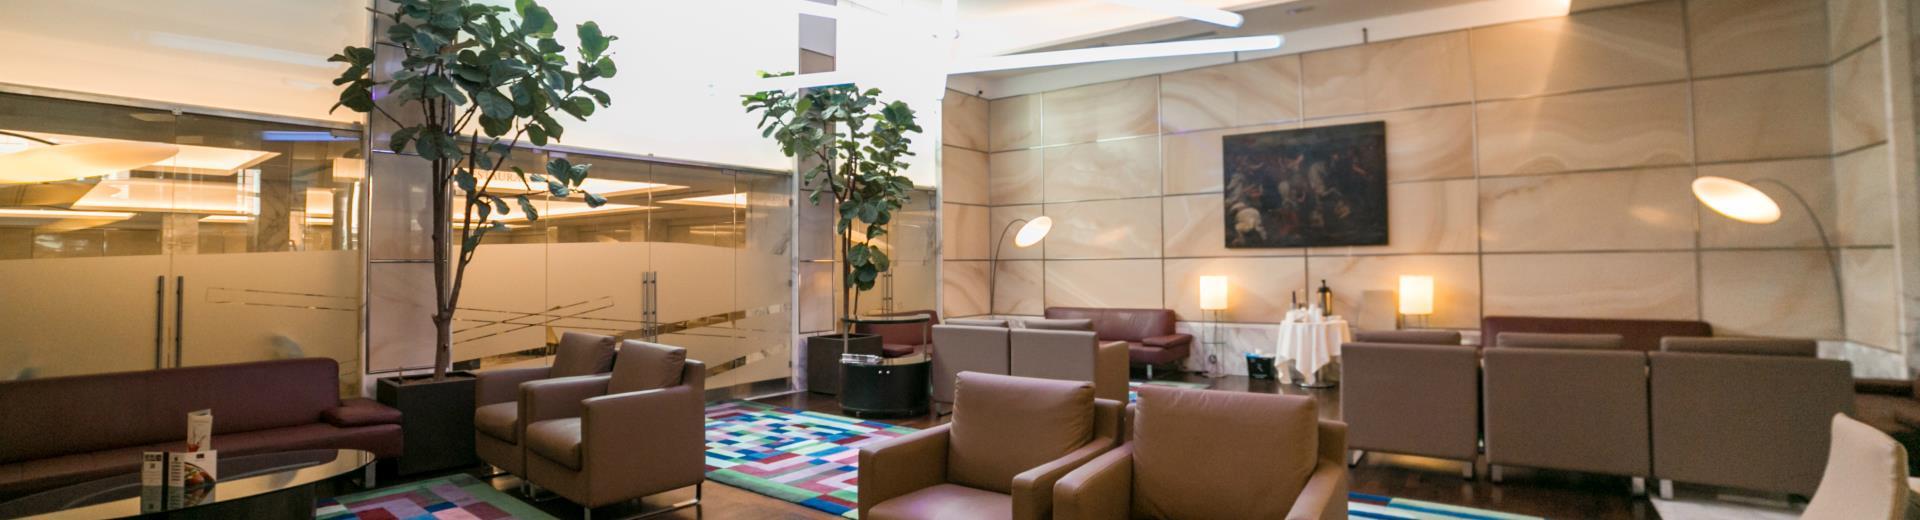 Aris Garden Hotel Roma